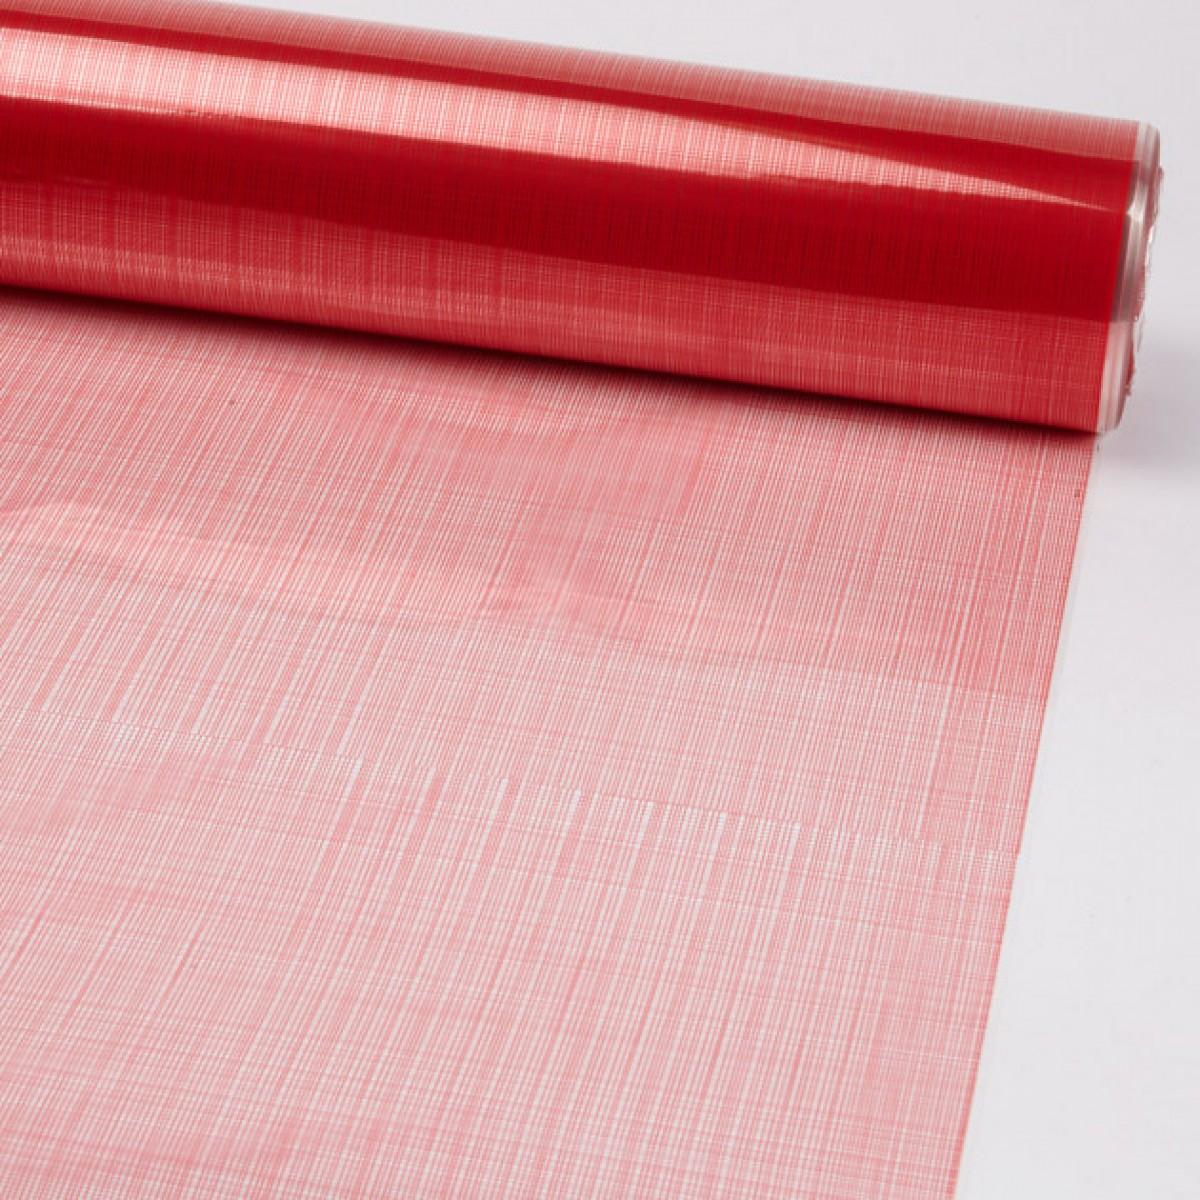 Hessian Red 80cmx25m 50mic Film - 1 Roll